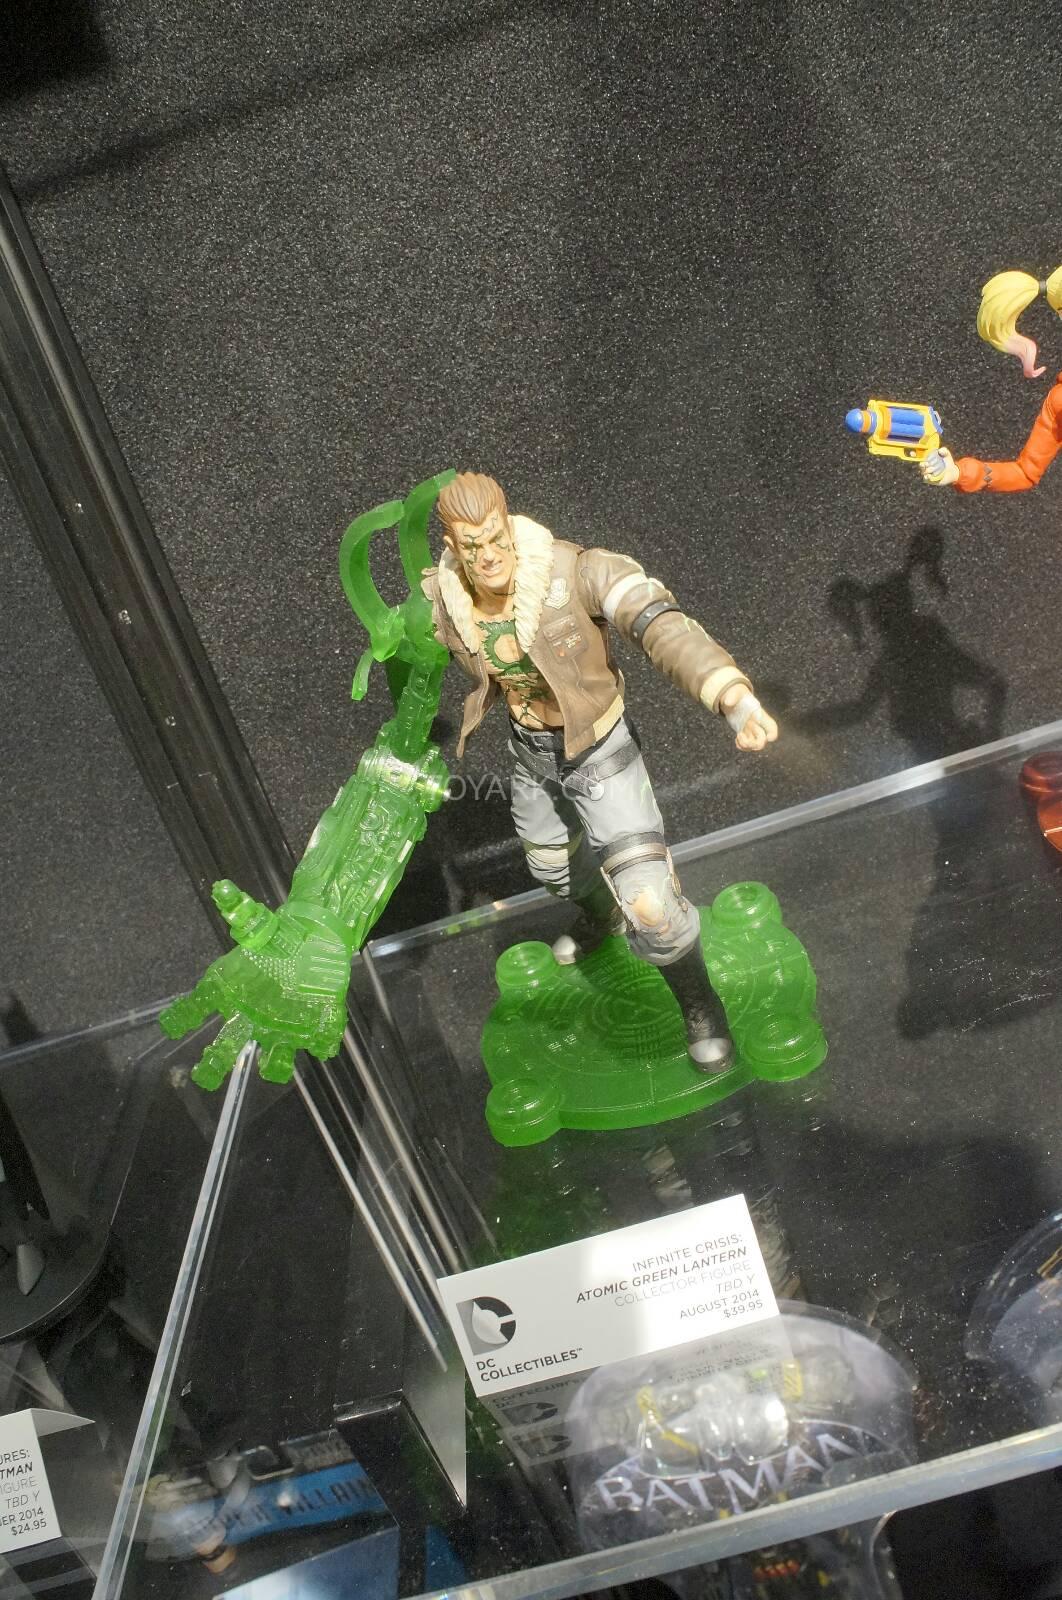 [Toy Fair 2014] DC Collectibles Toy-Fair-2014-DC-Collectibles-138